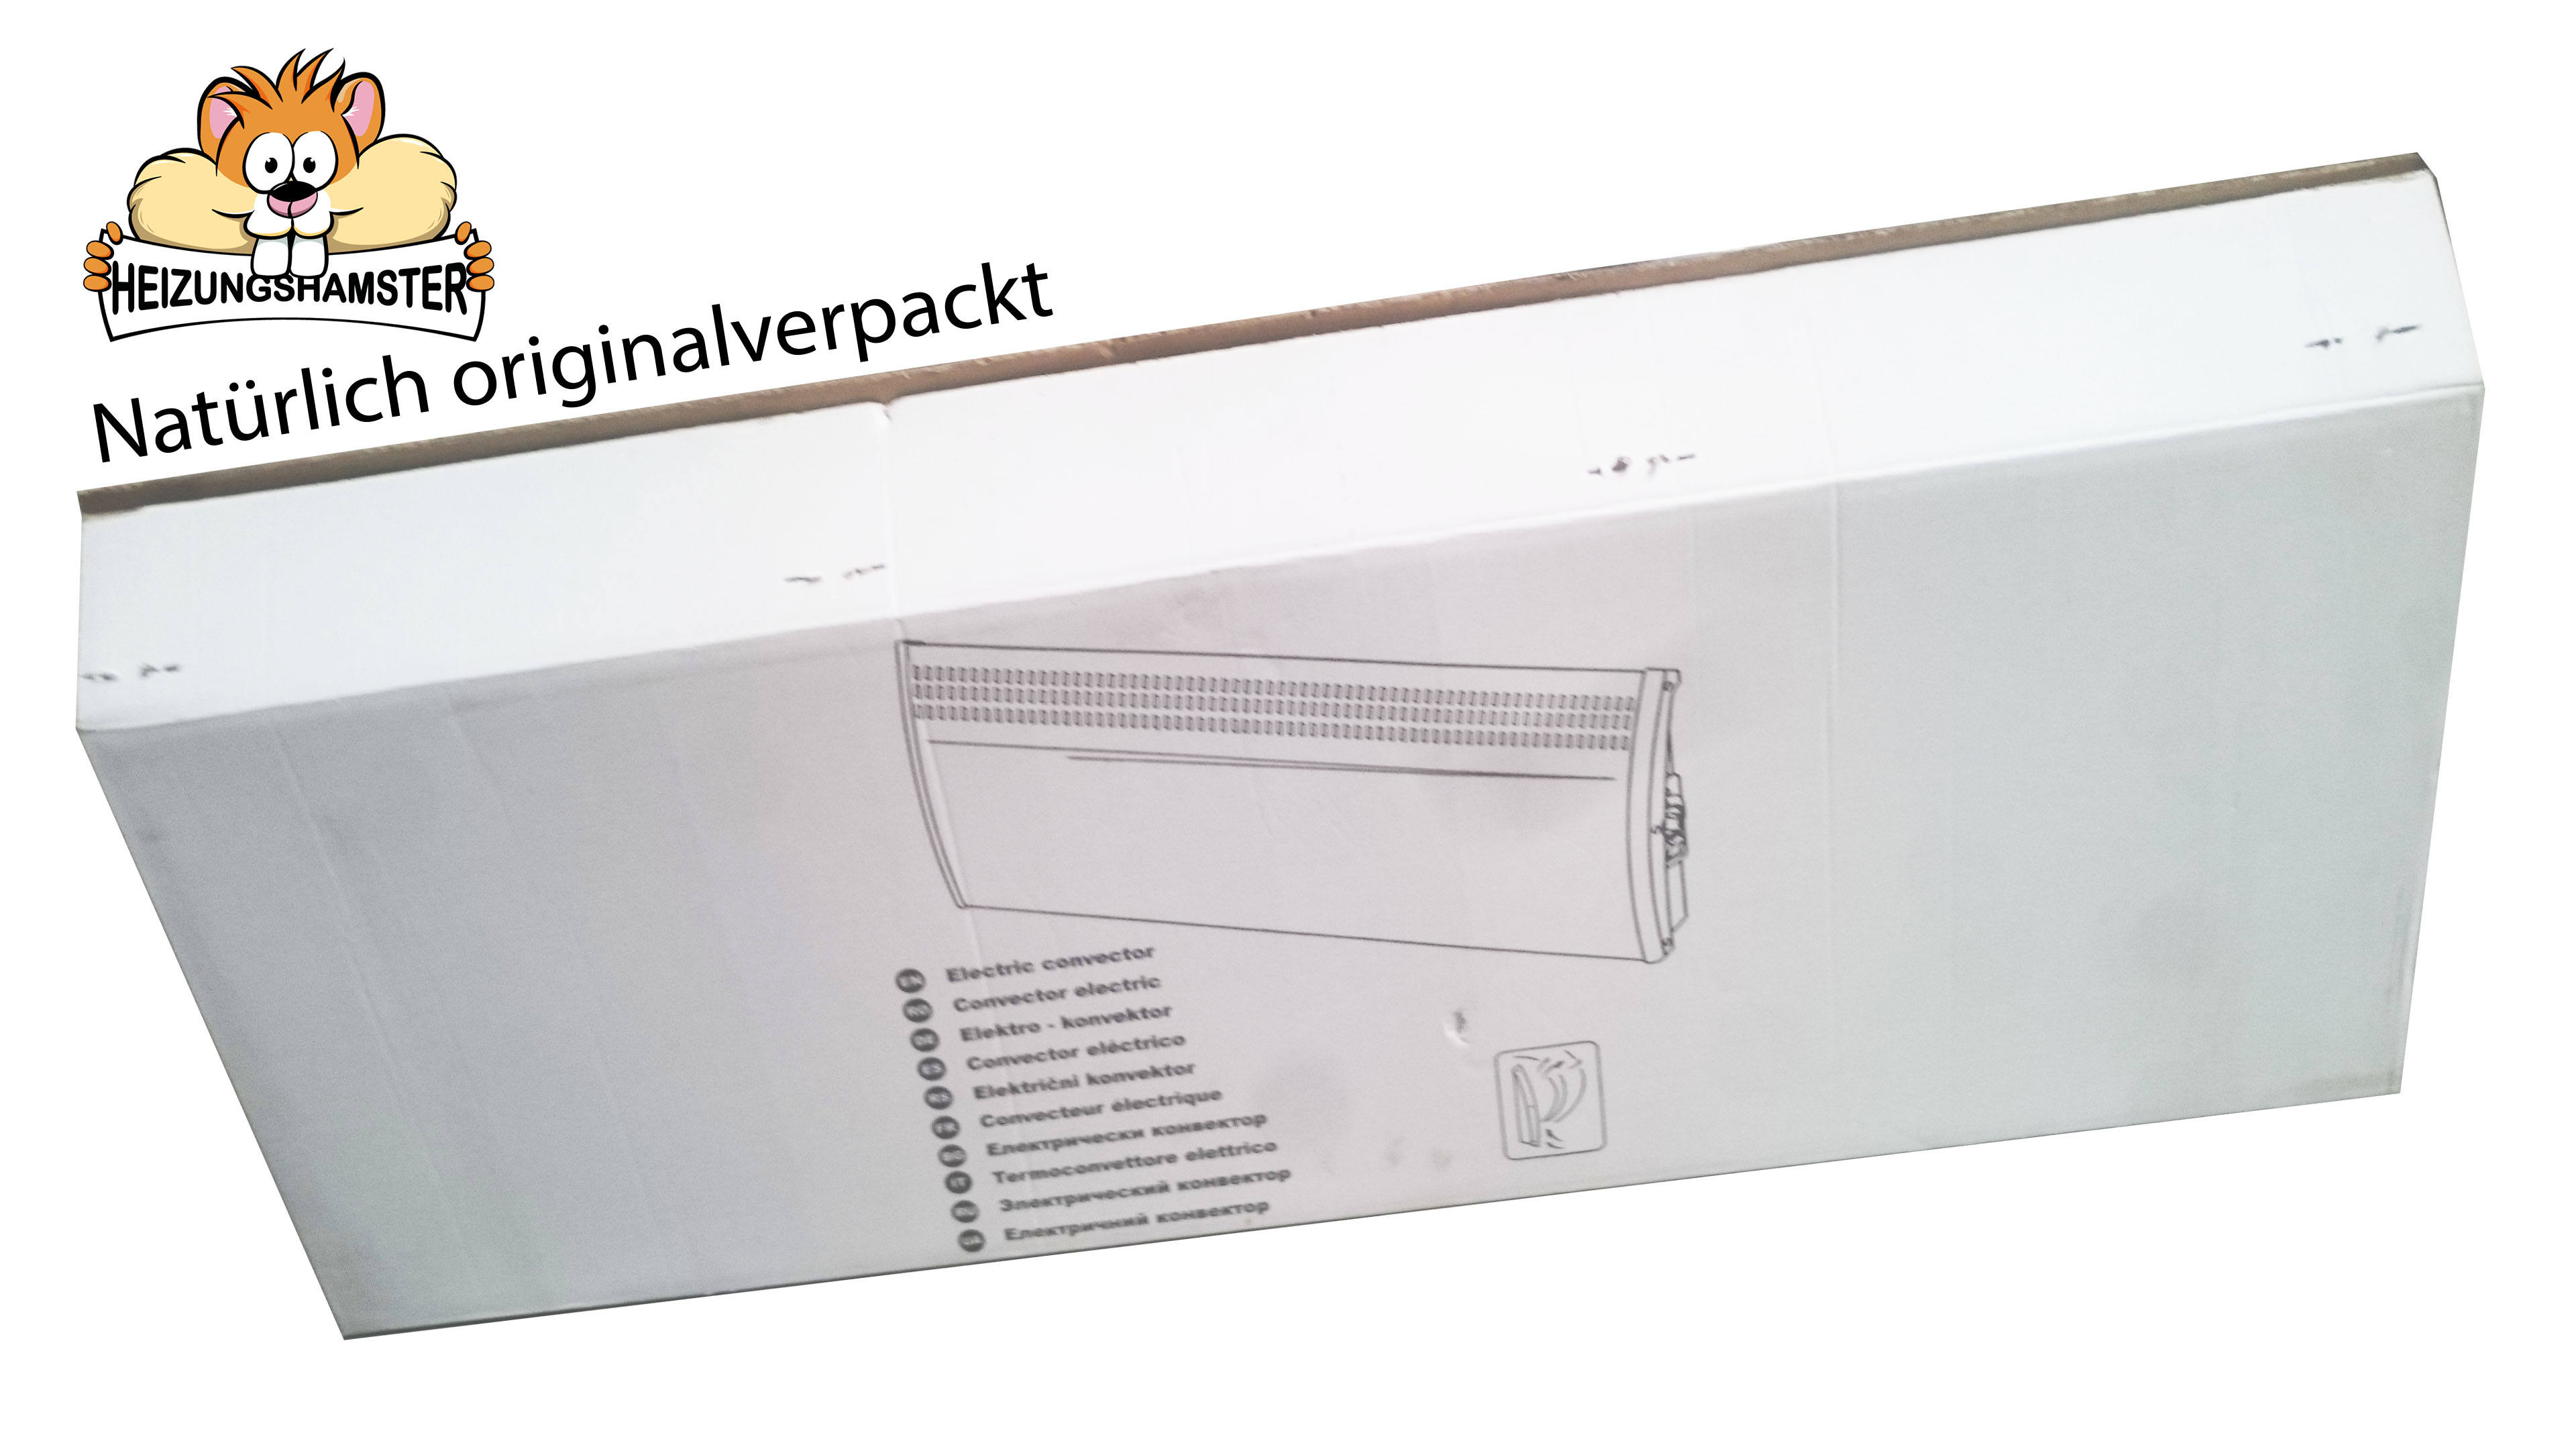 elektro heizkoerper heizung 1500 watt heizk rper wand komplett ko ebay. Black Bedroom Furniture Sets. Home Design Ideas